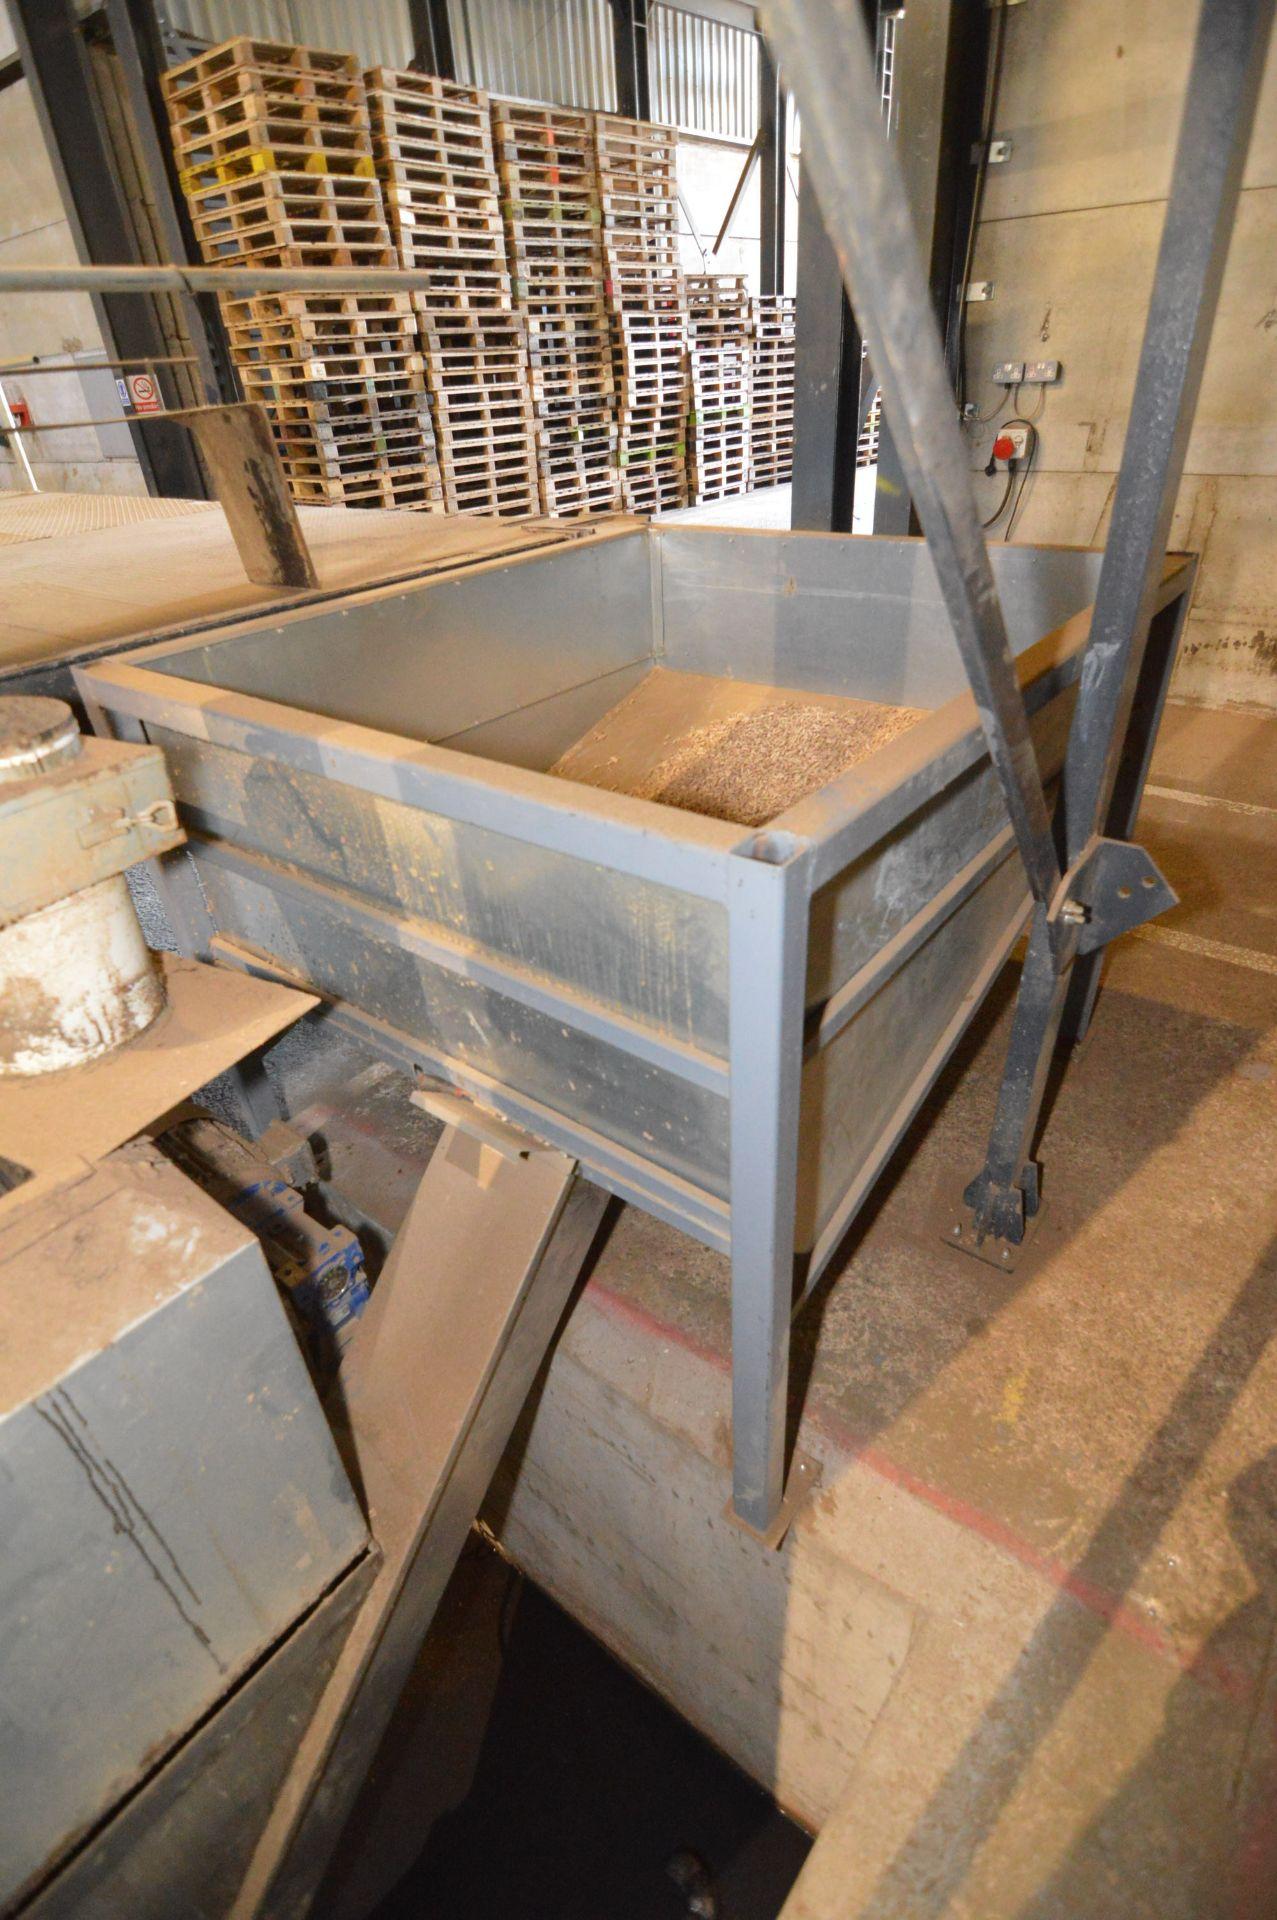 Lot 17 - Steel Framed Returns Hopper, approx. 1.45m x 1.25m